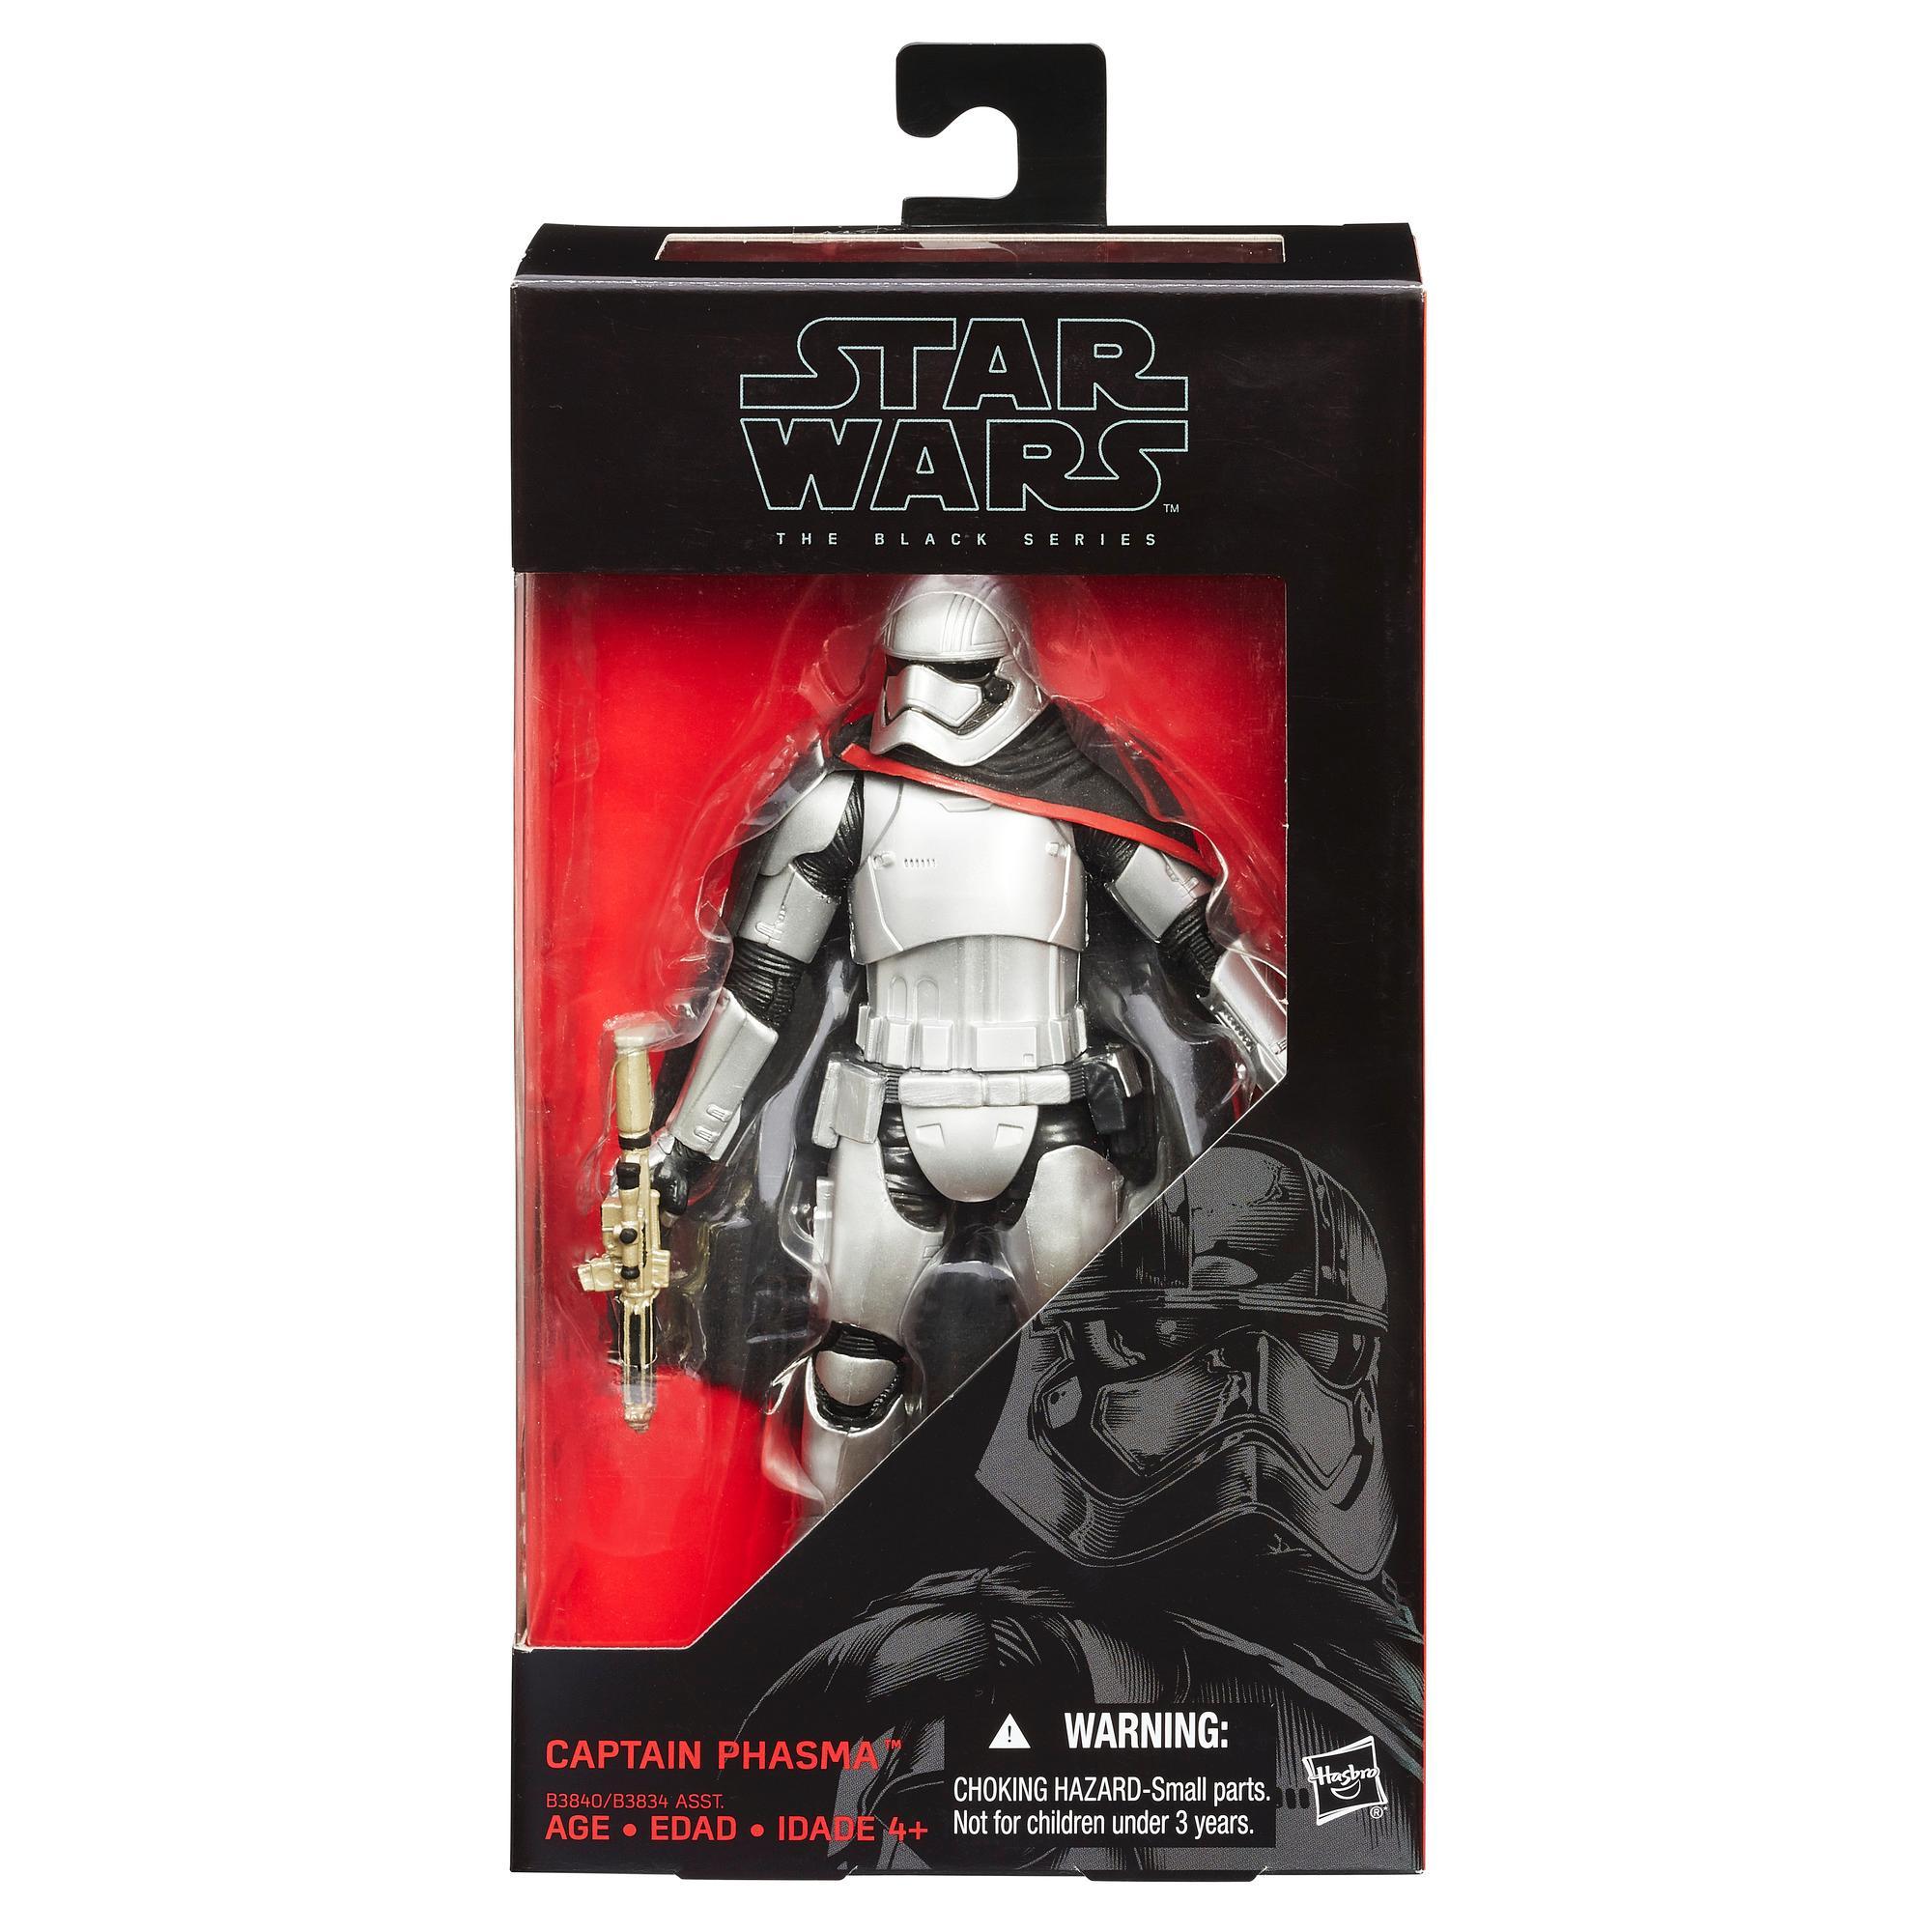 Star Wars – The Black Series Capitan Phasma 15 cm